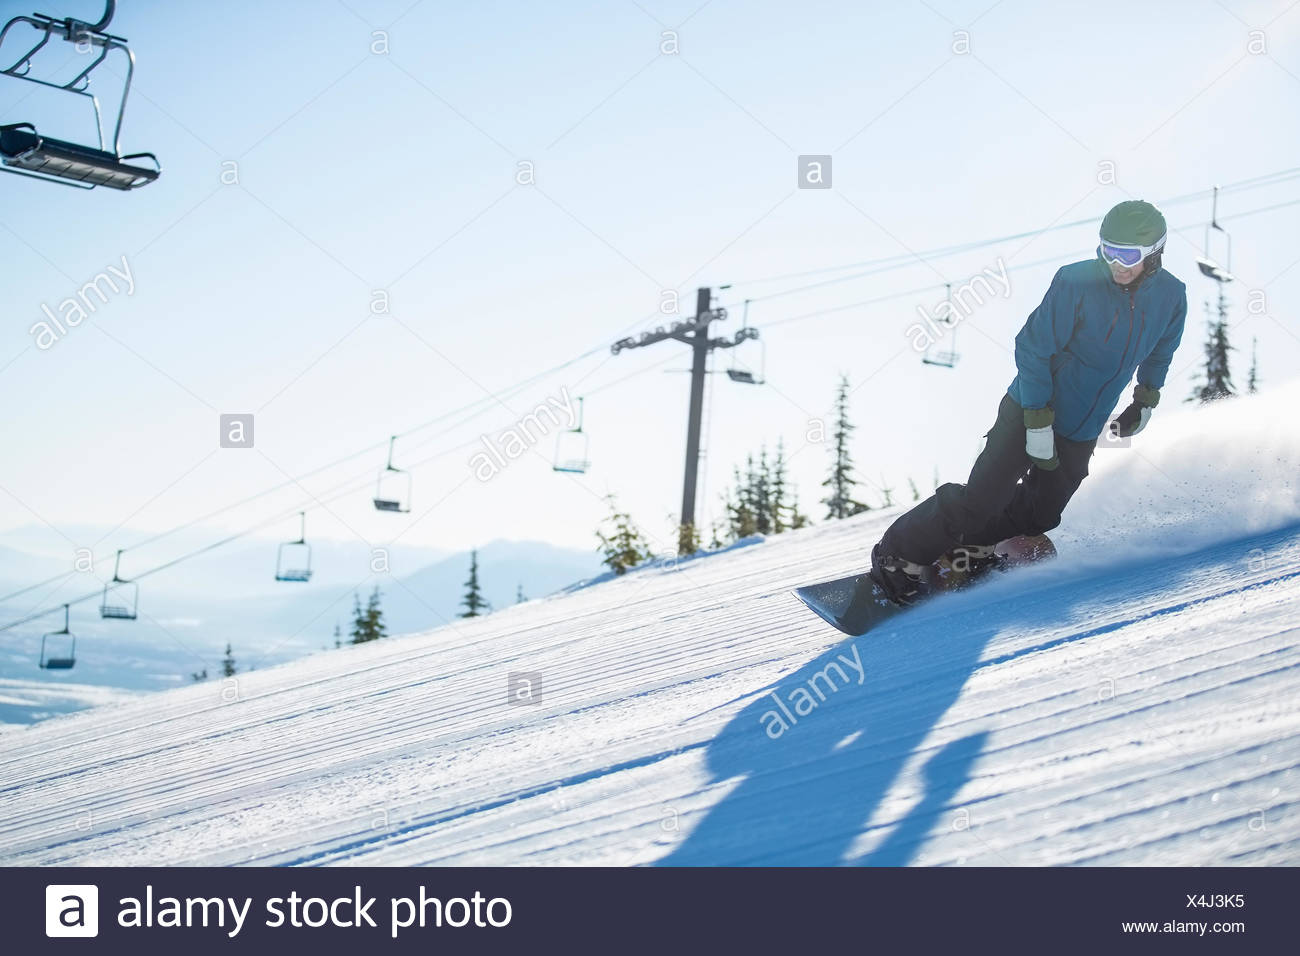 Man snowboarding downhill - Stock Image